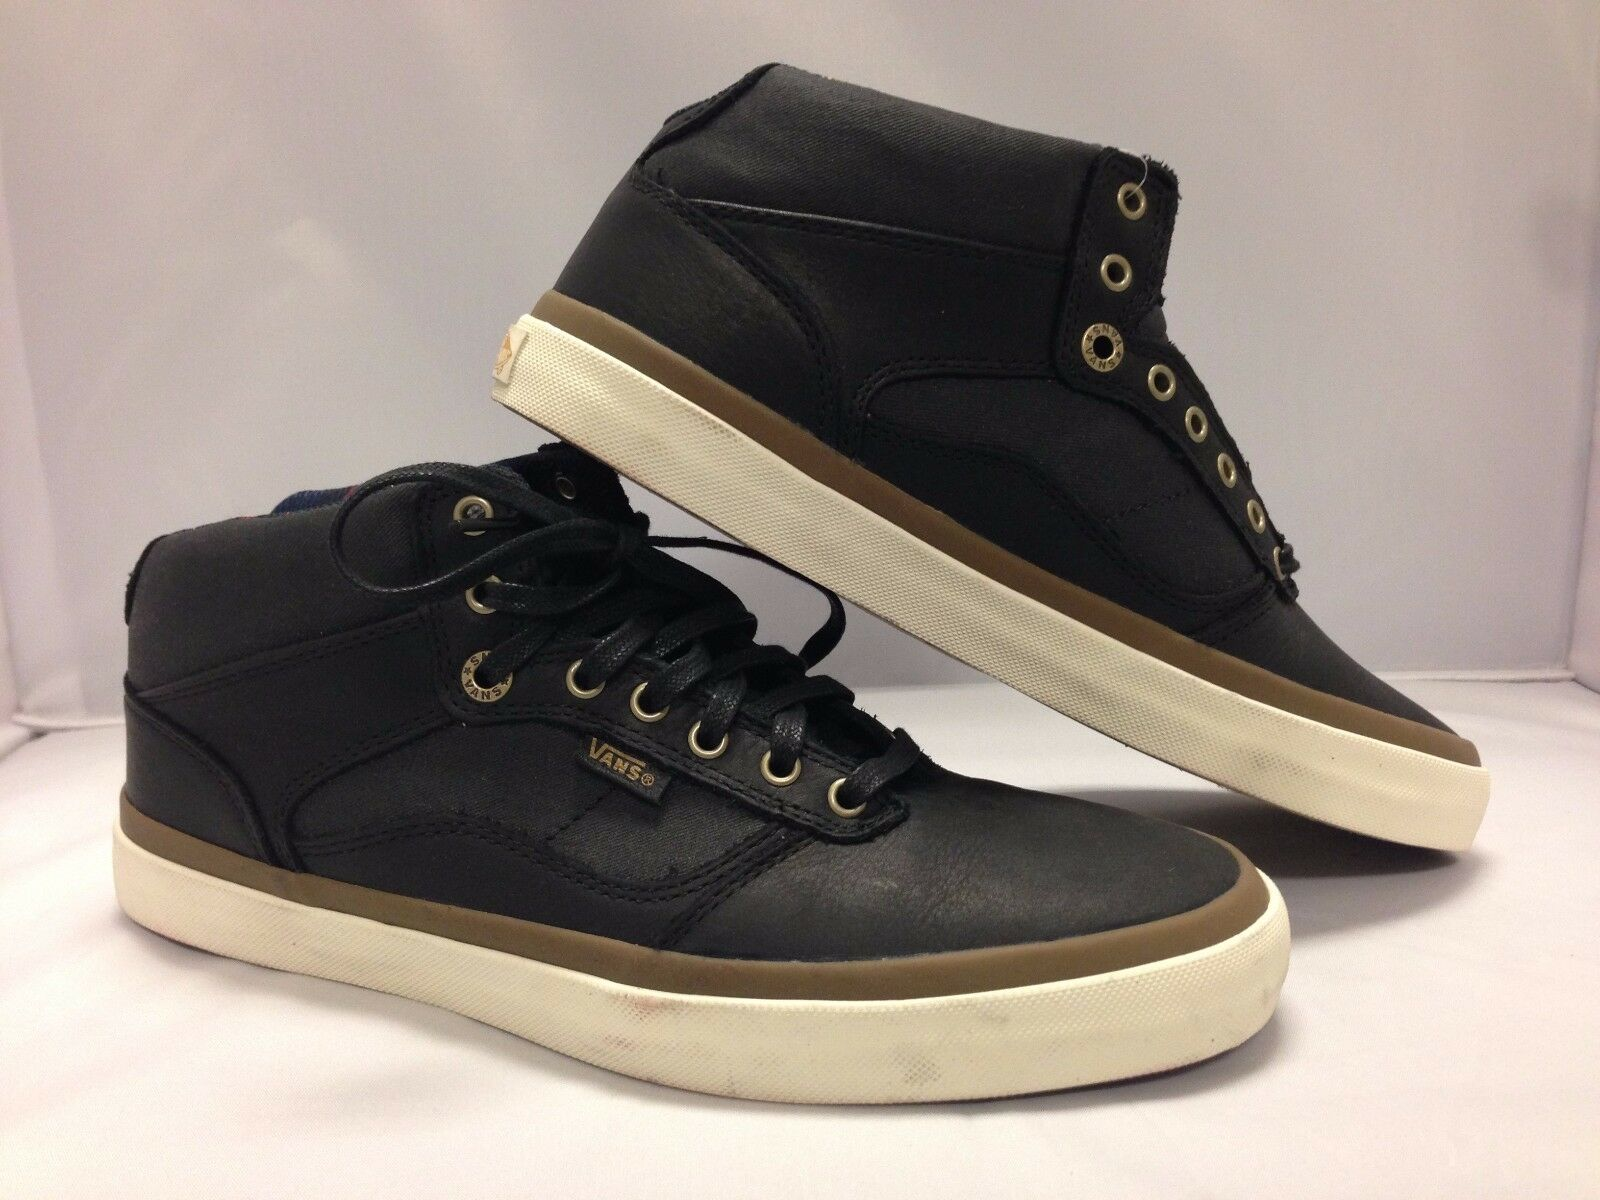 Vans Homme Chaussures